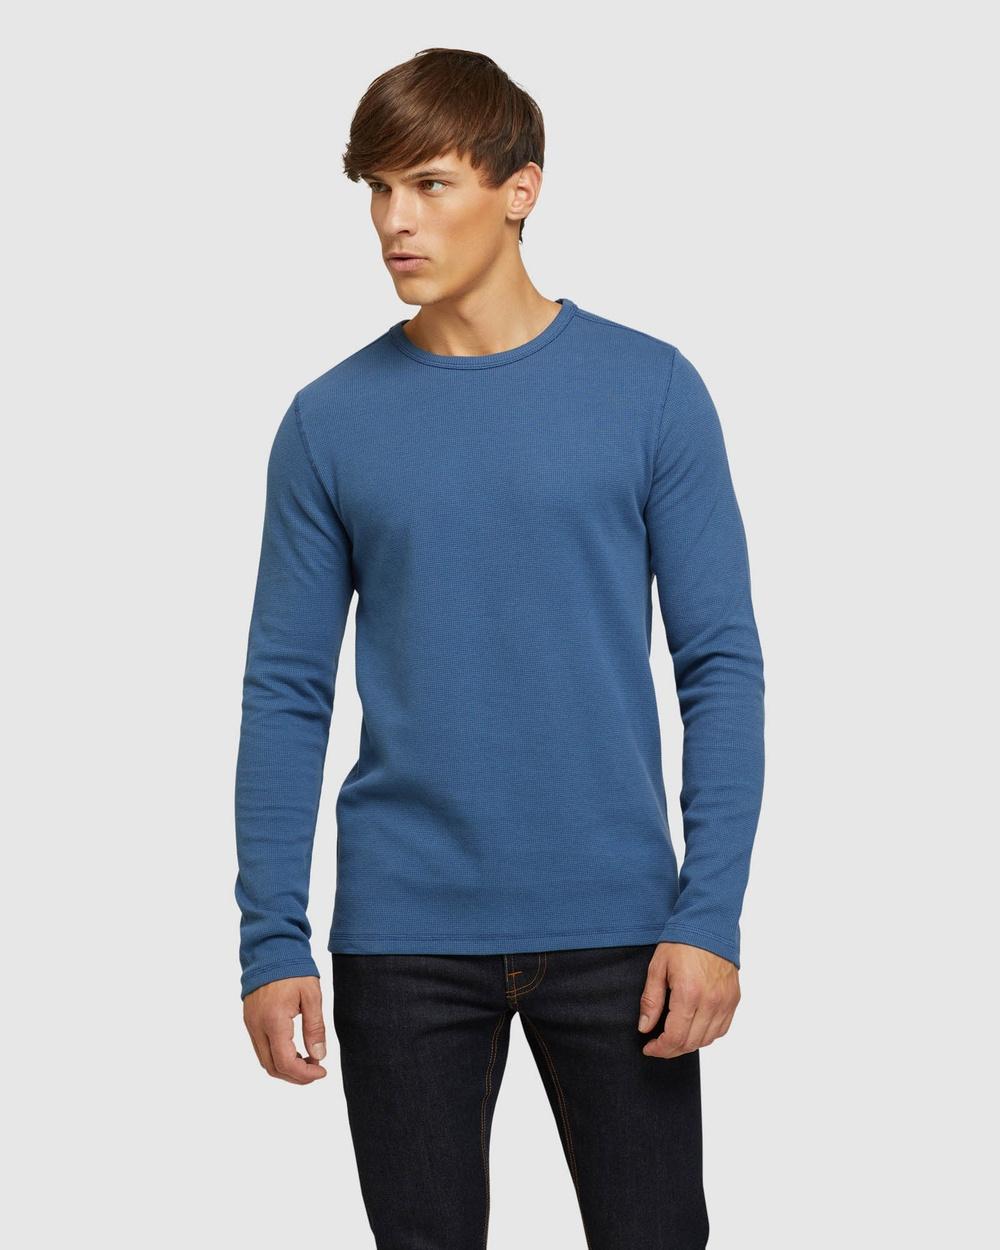 Oxford - Albert Waffle Crew Neck Long Sleeve - Long Sleeve T-Shirts (Blue) Albert Waffle Crew Neck Long Sleeve